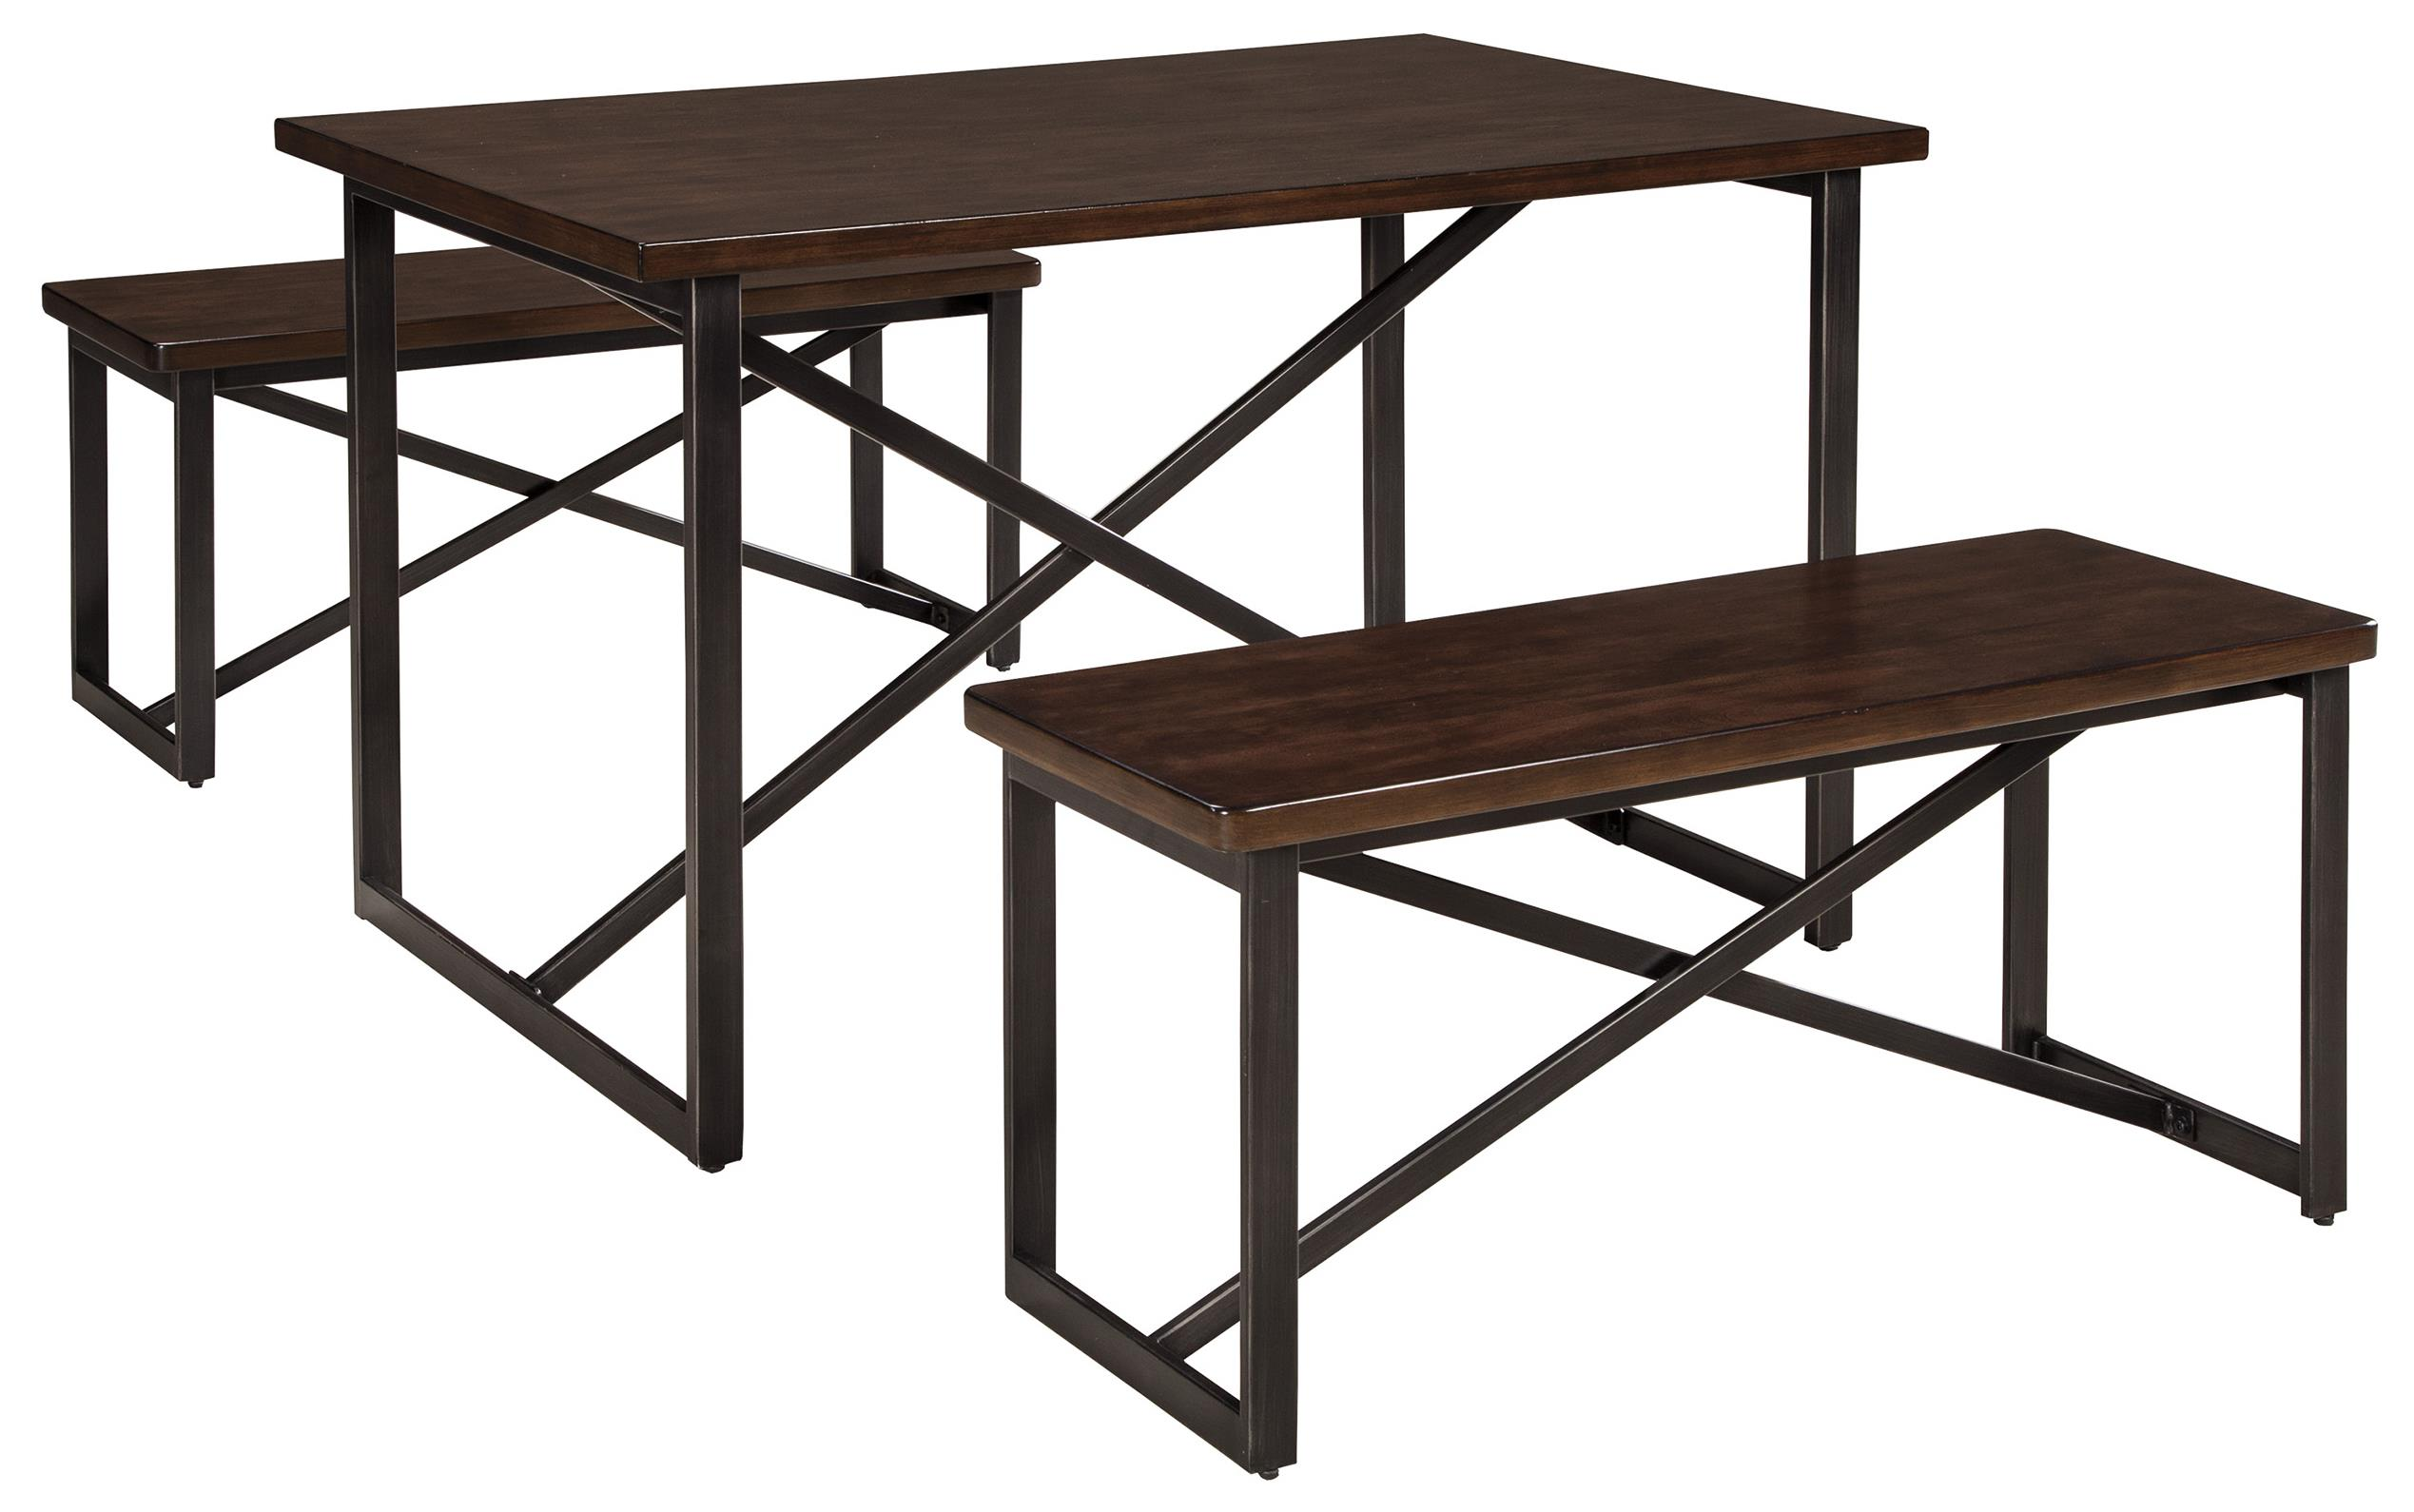 Signature Design by Ashley Joring Rectangular Dining Room Table Set - Item Number: D301-125